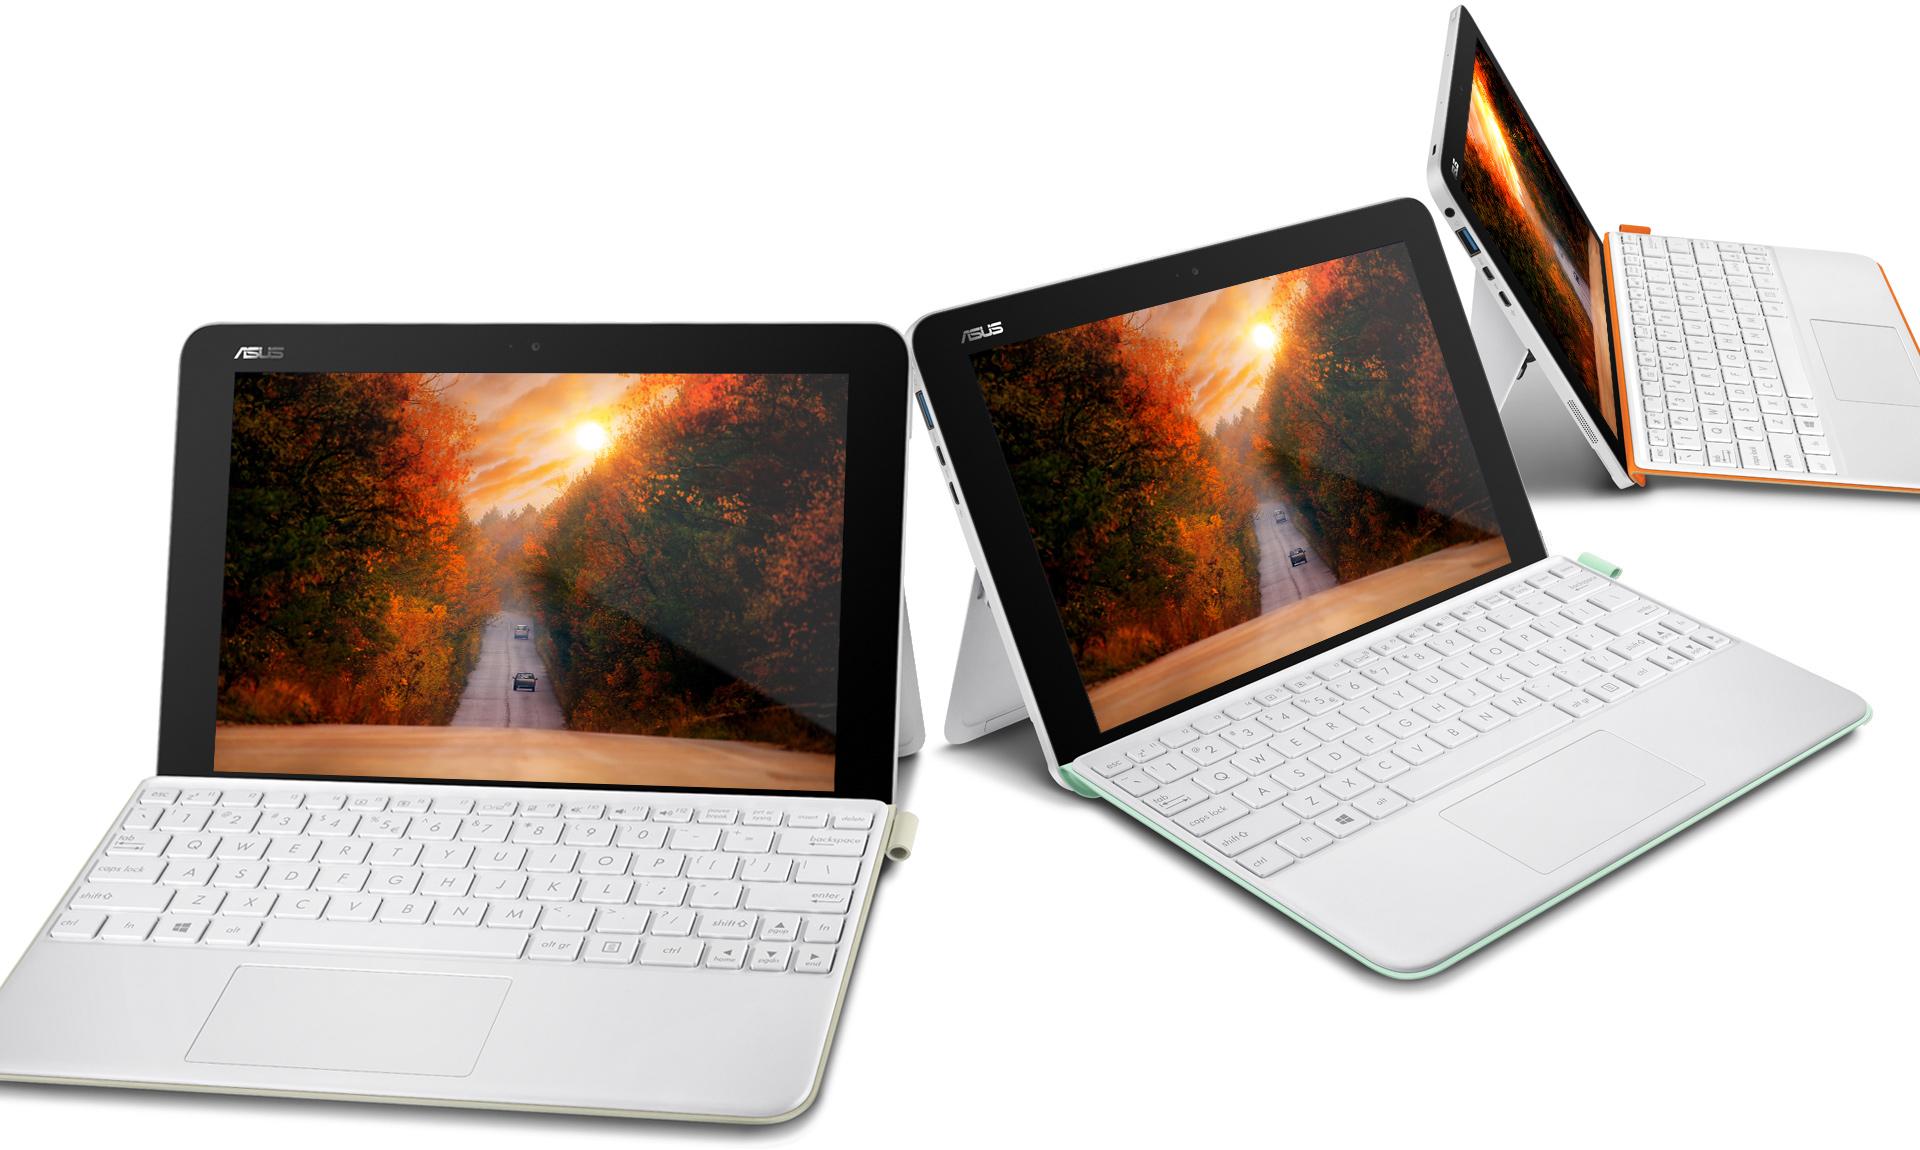 ТОП ноутбуков до 15000 гривен 7